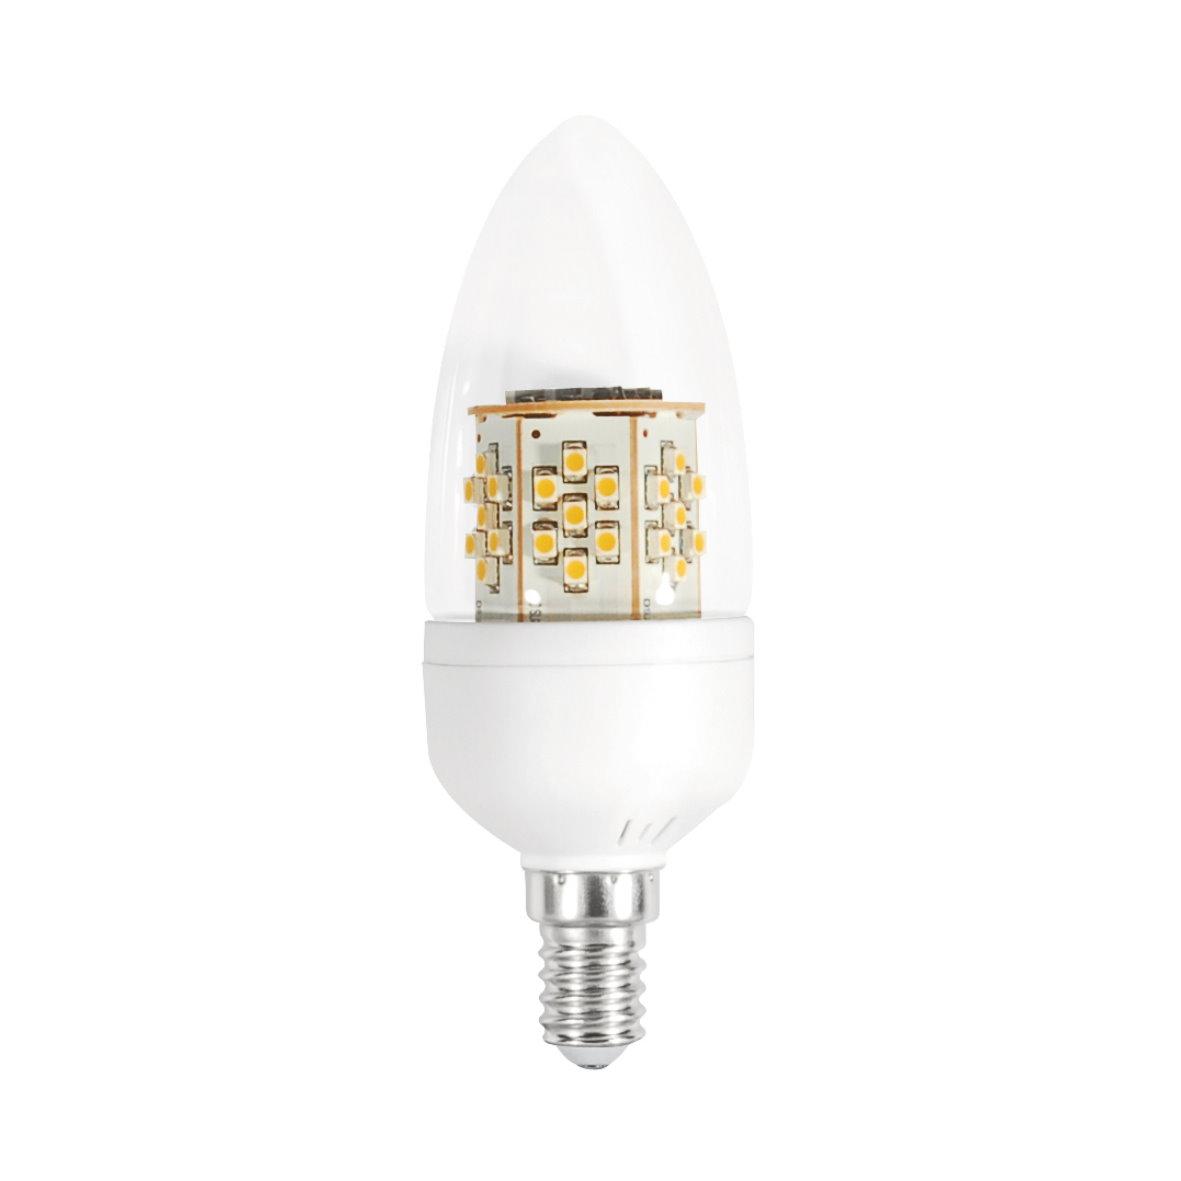 smd led 360 stab leuchtmittel mais kolben birne rgb glas e14 e27 3 27w ebay. Black Bedroom Furniture Sets. Home Design Ideas